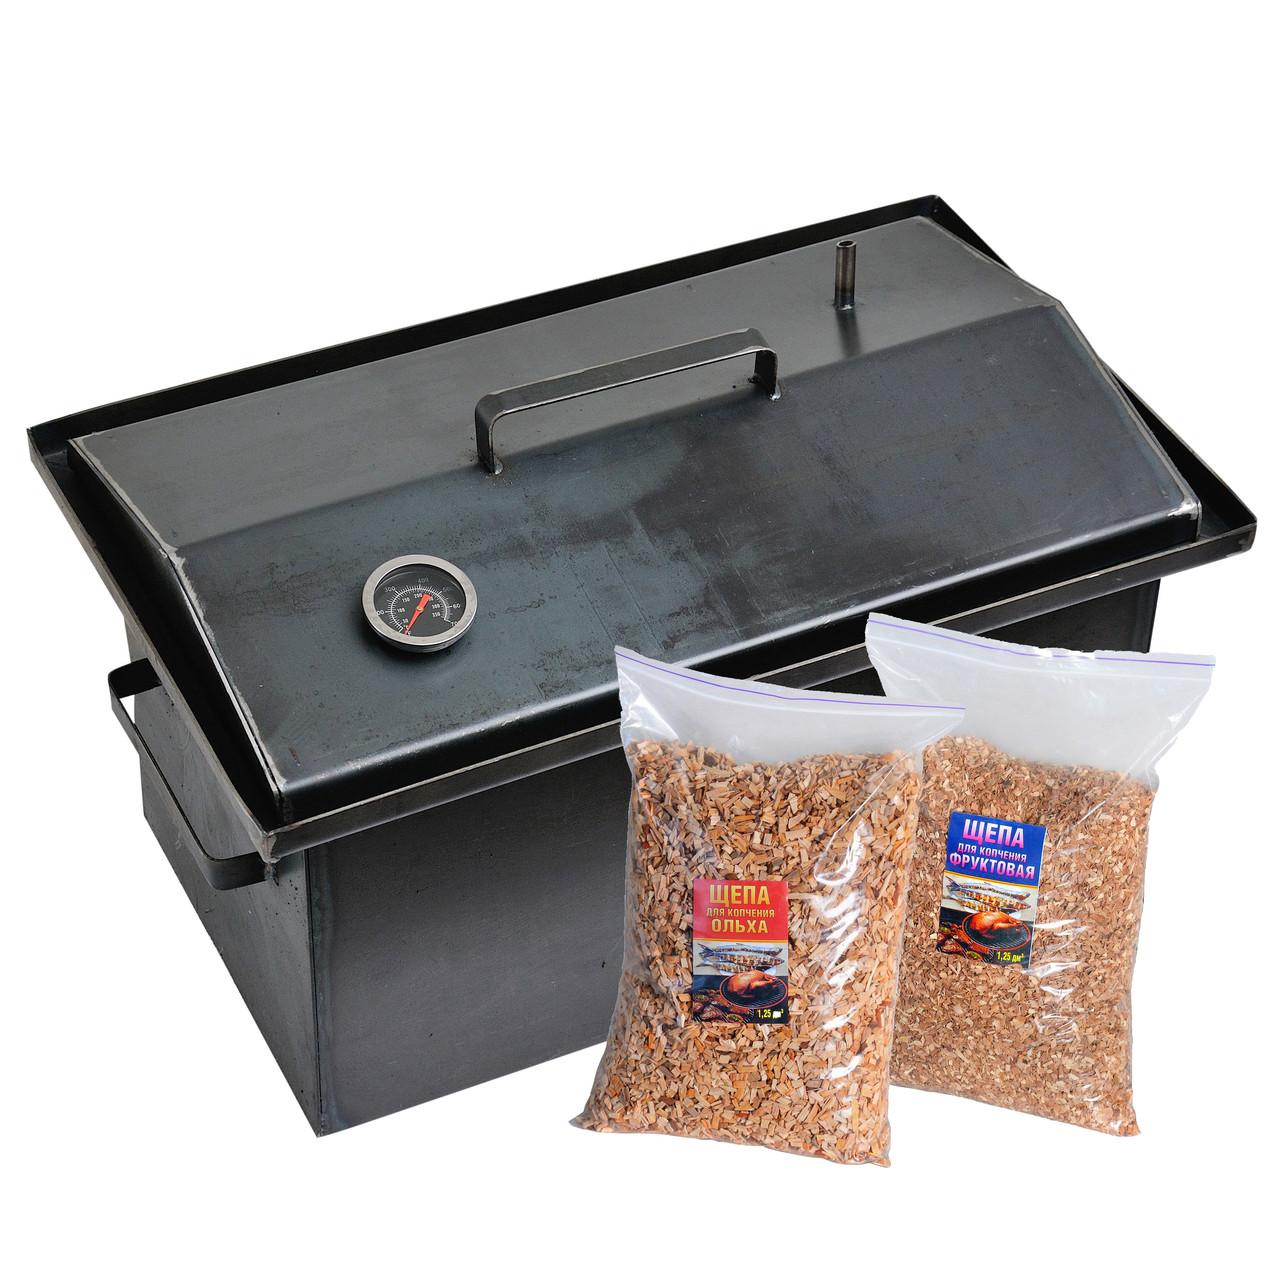 Коптильня горячего копчения 2мм 460х260х240мм с термометром + 2кг щепа (коптилка,каптилка)